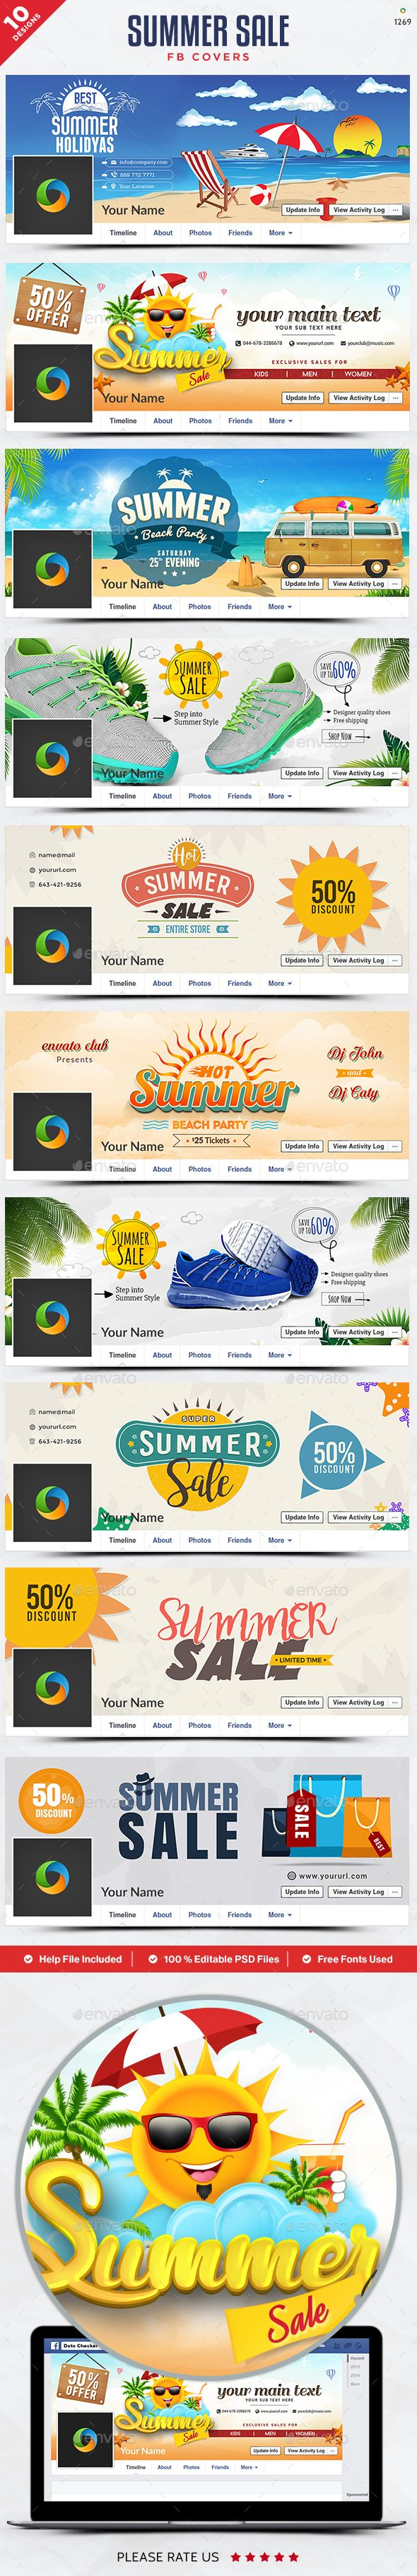 Summer Sale Facebook Cover Templates Bundle 10 Designs Facebook Cover Template Cover Template Facebook Cover